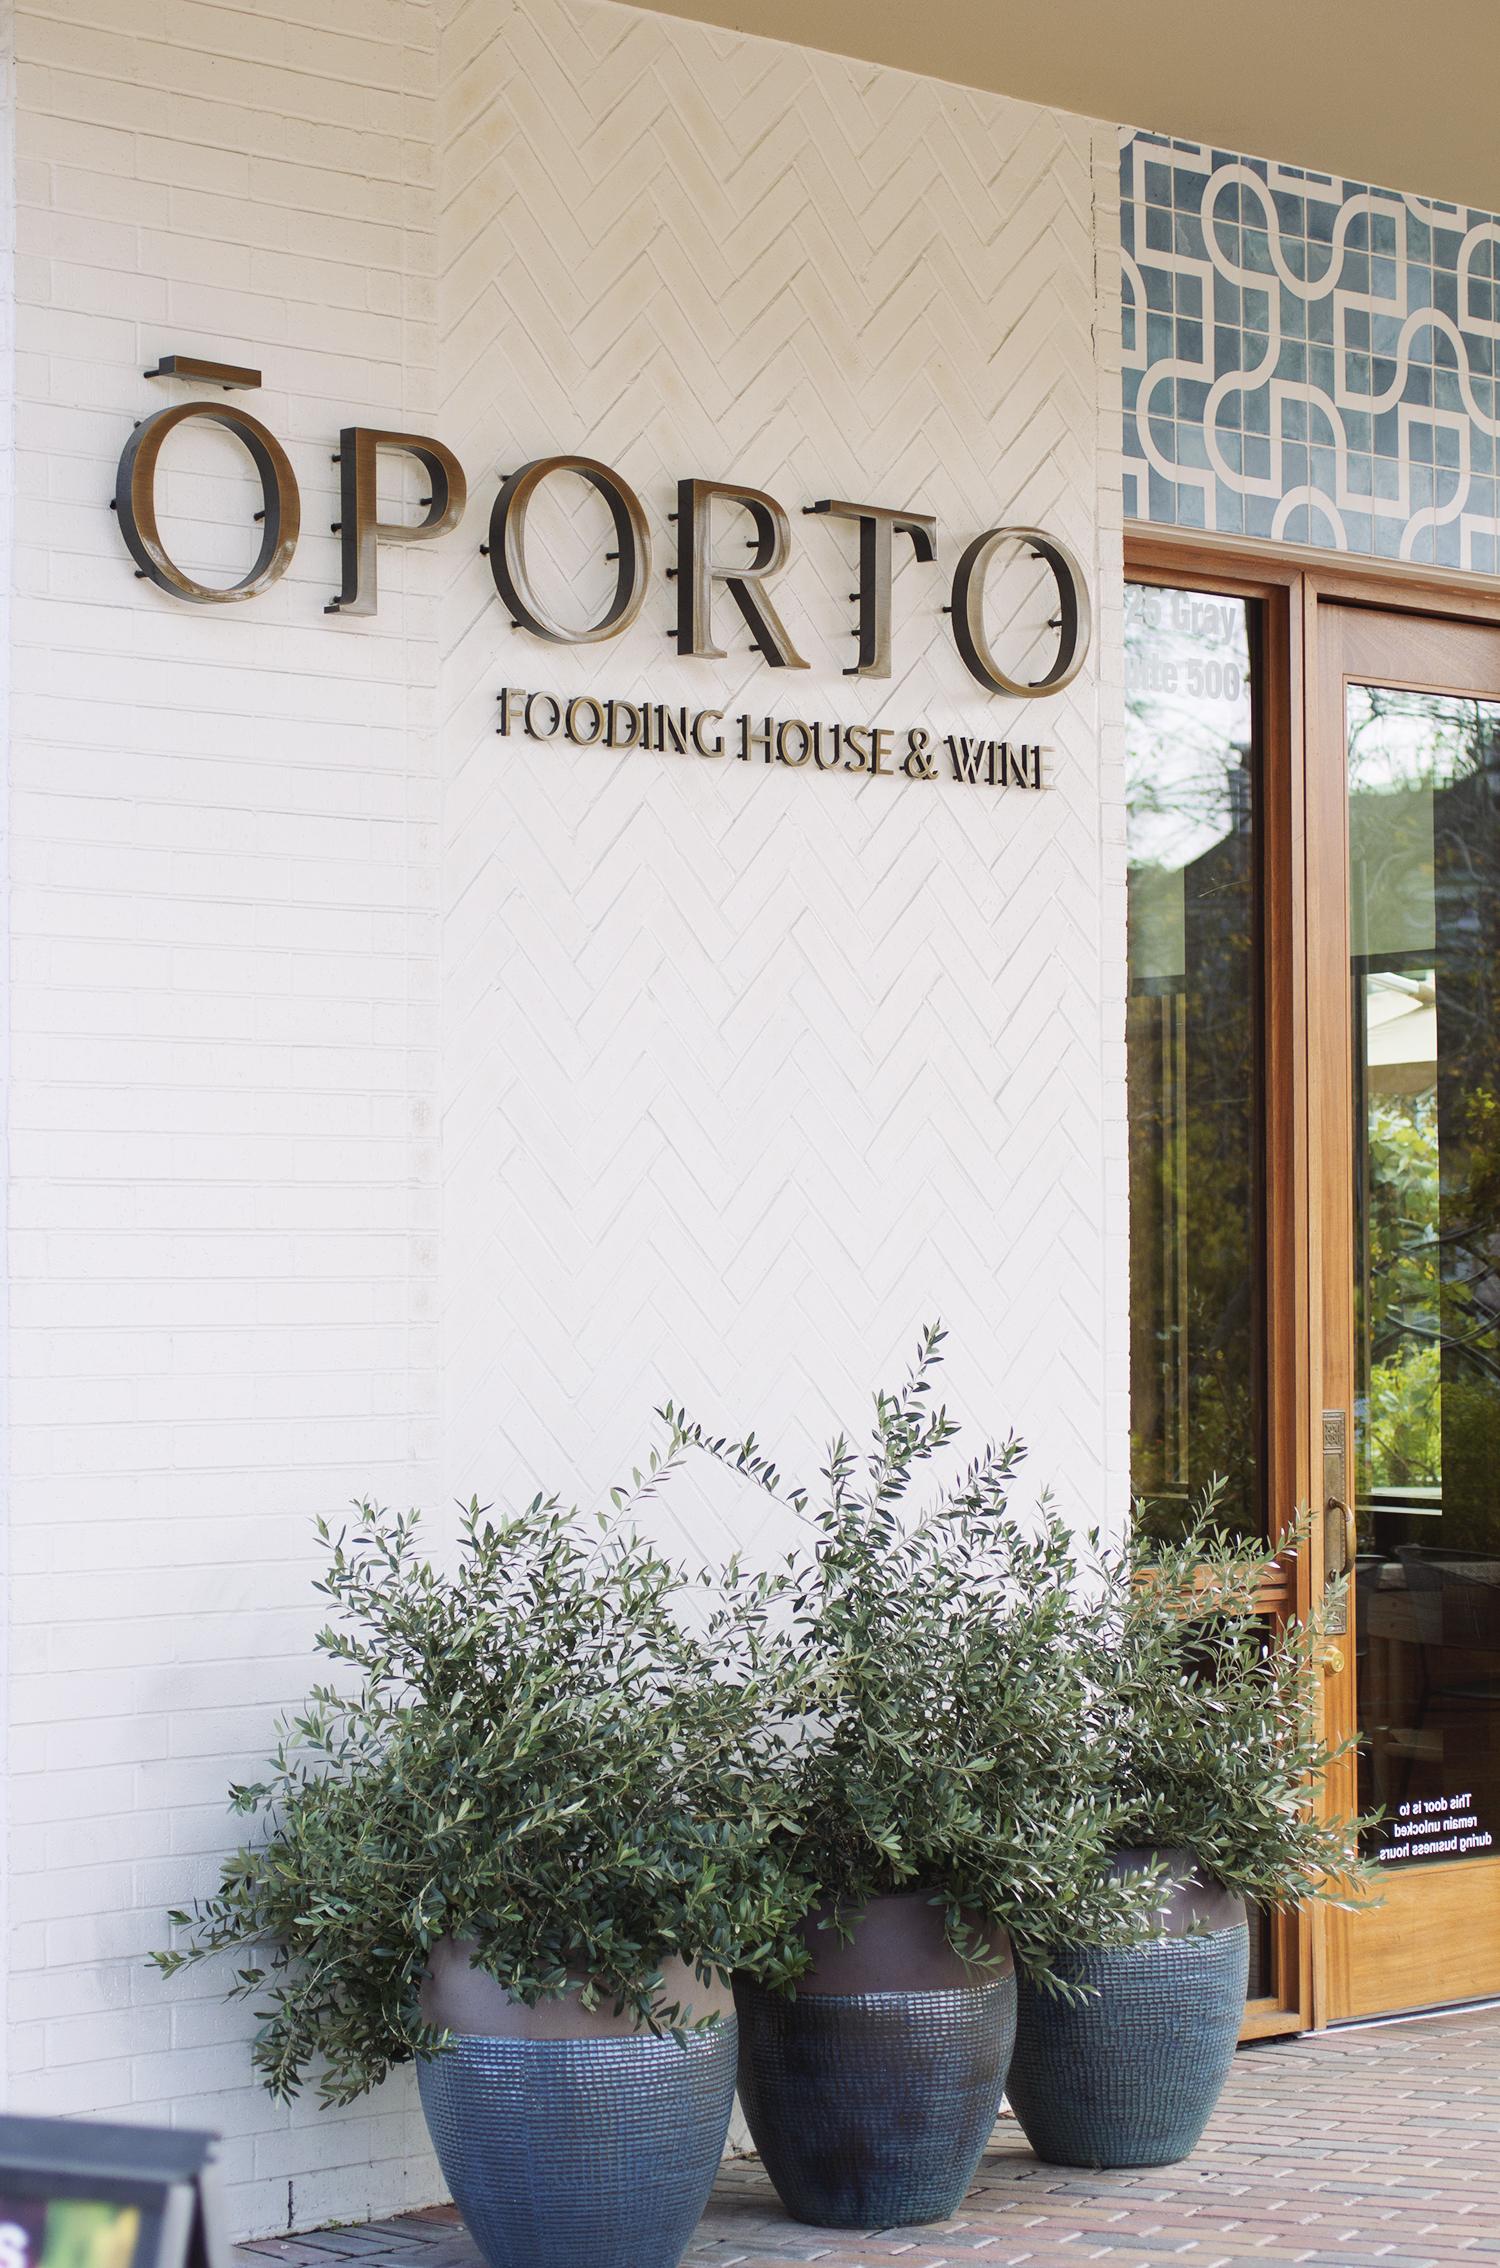 Oporto // The Pancake Princess